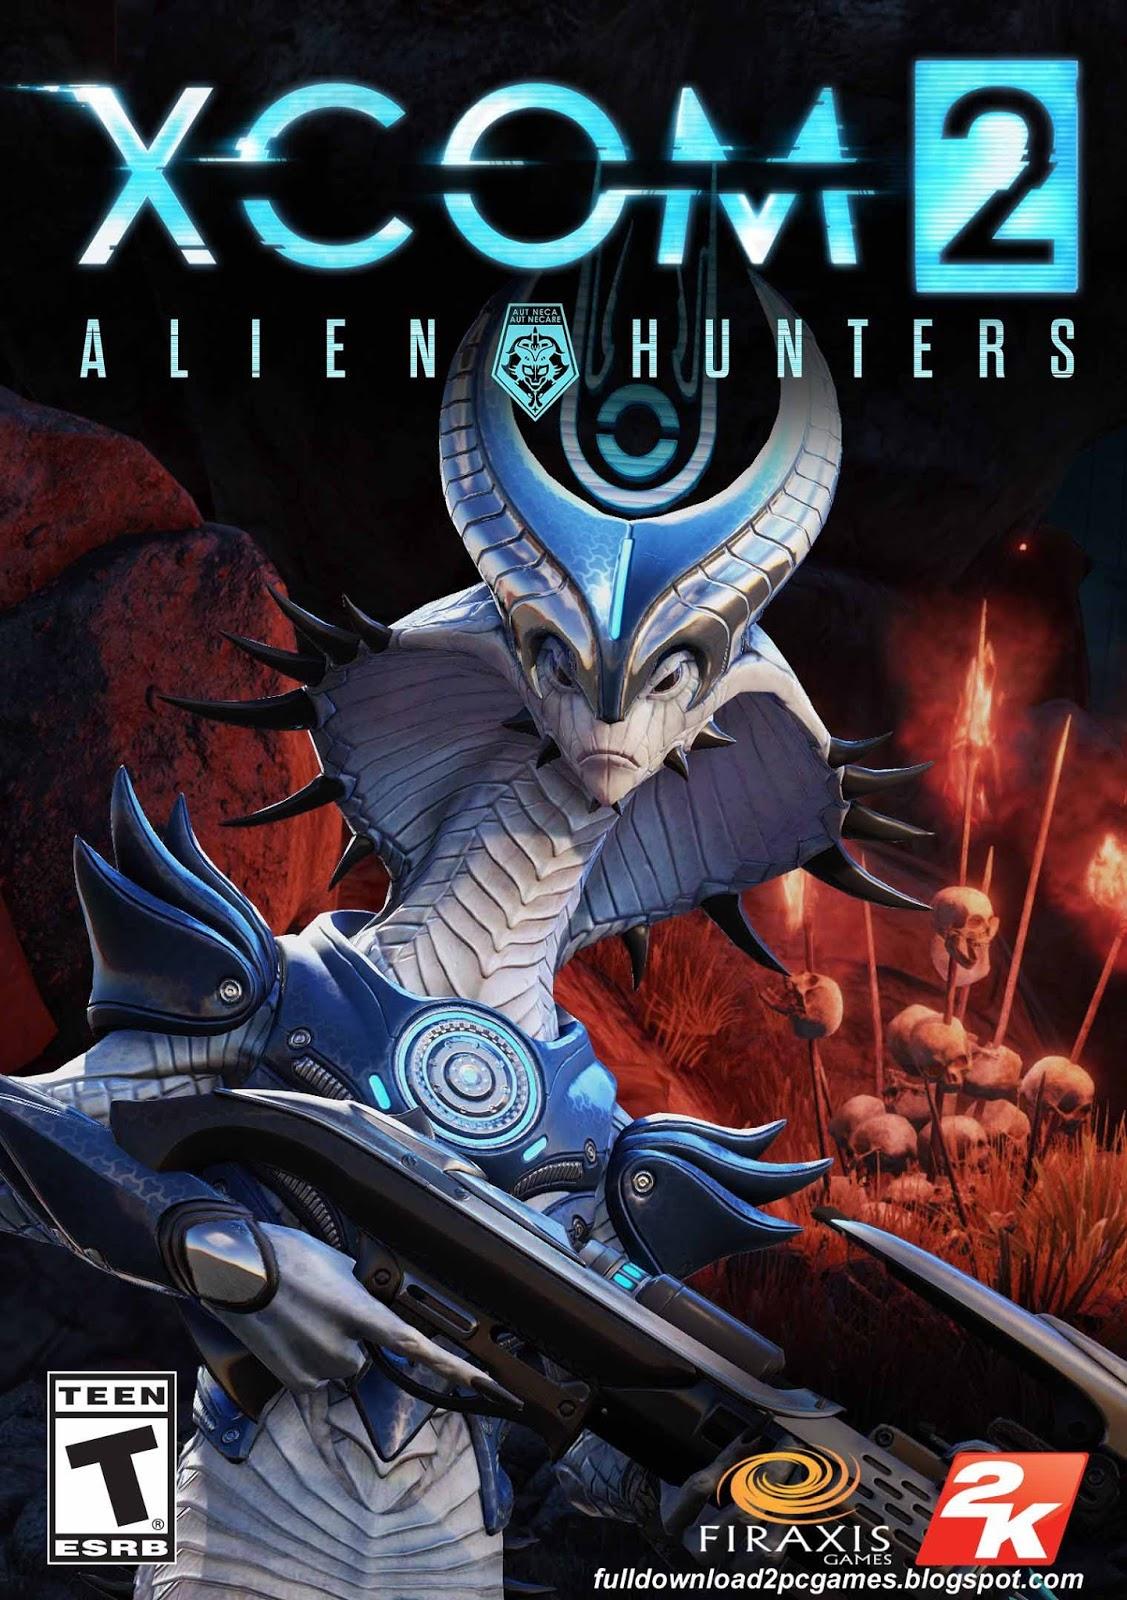 XCOM 2 Alien Hunters Free Download PC Game DLC Full